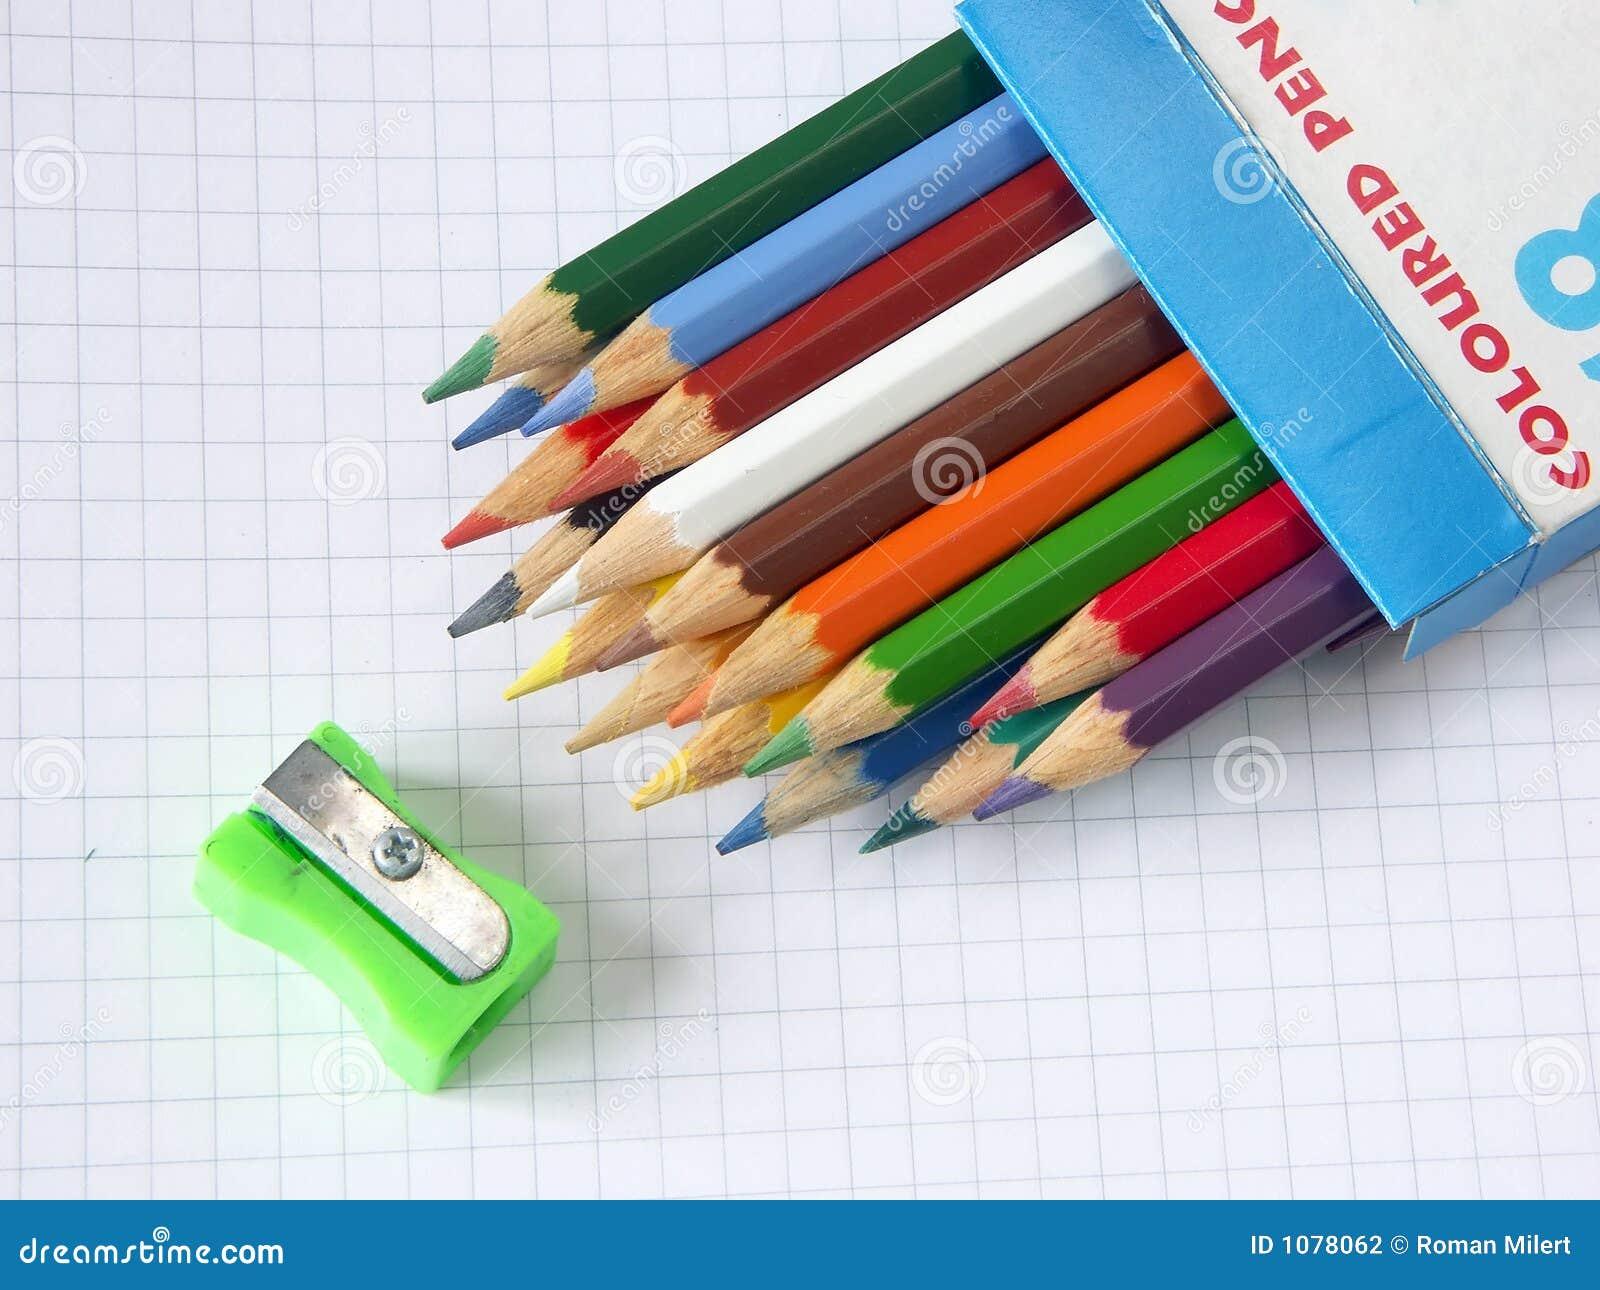 Box Of Colored Pencils : Box of colored pencils and sharpener stock photography